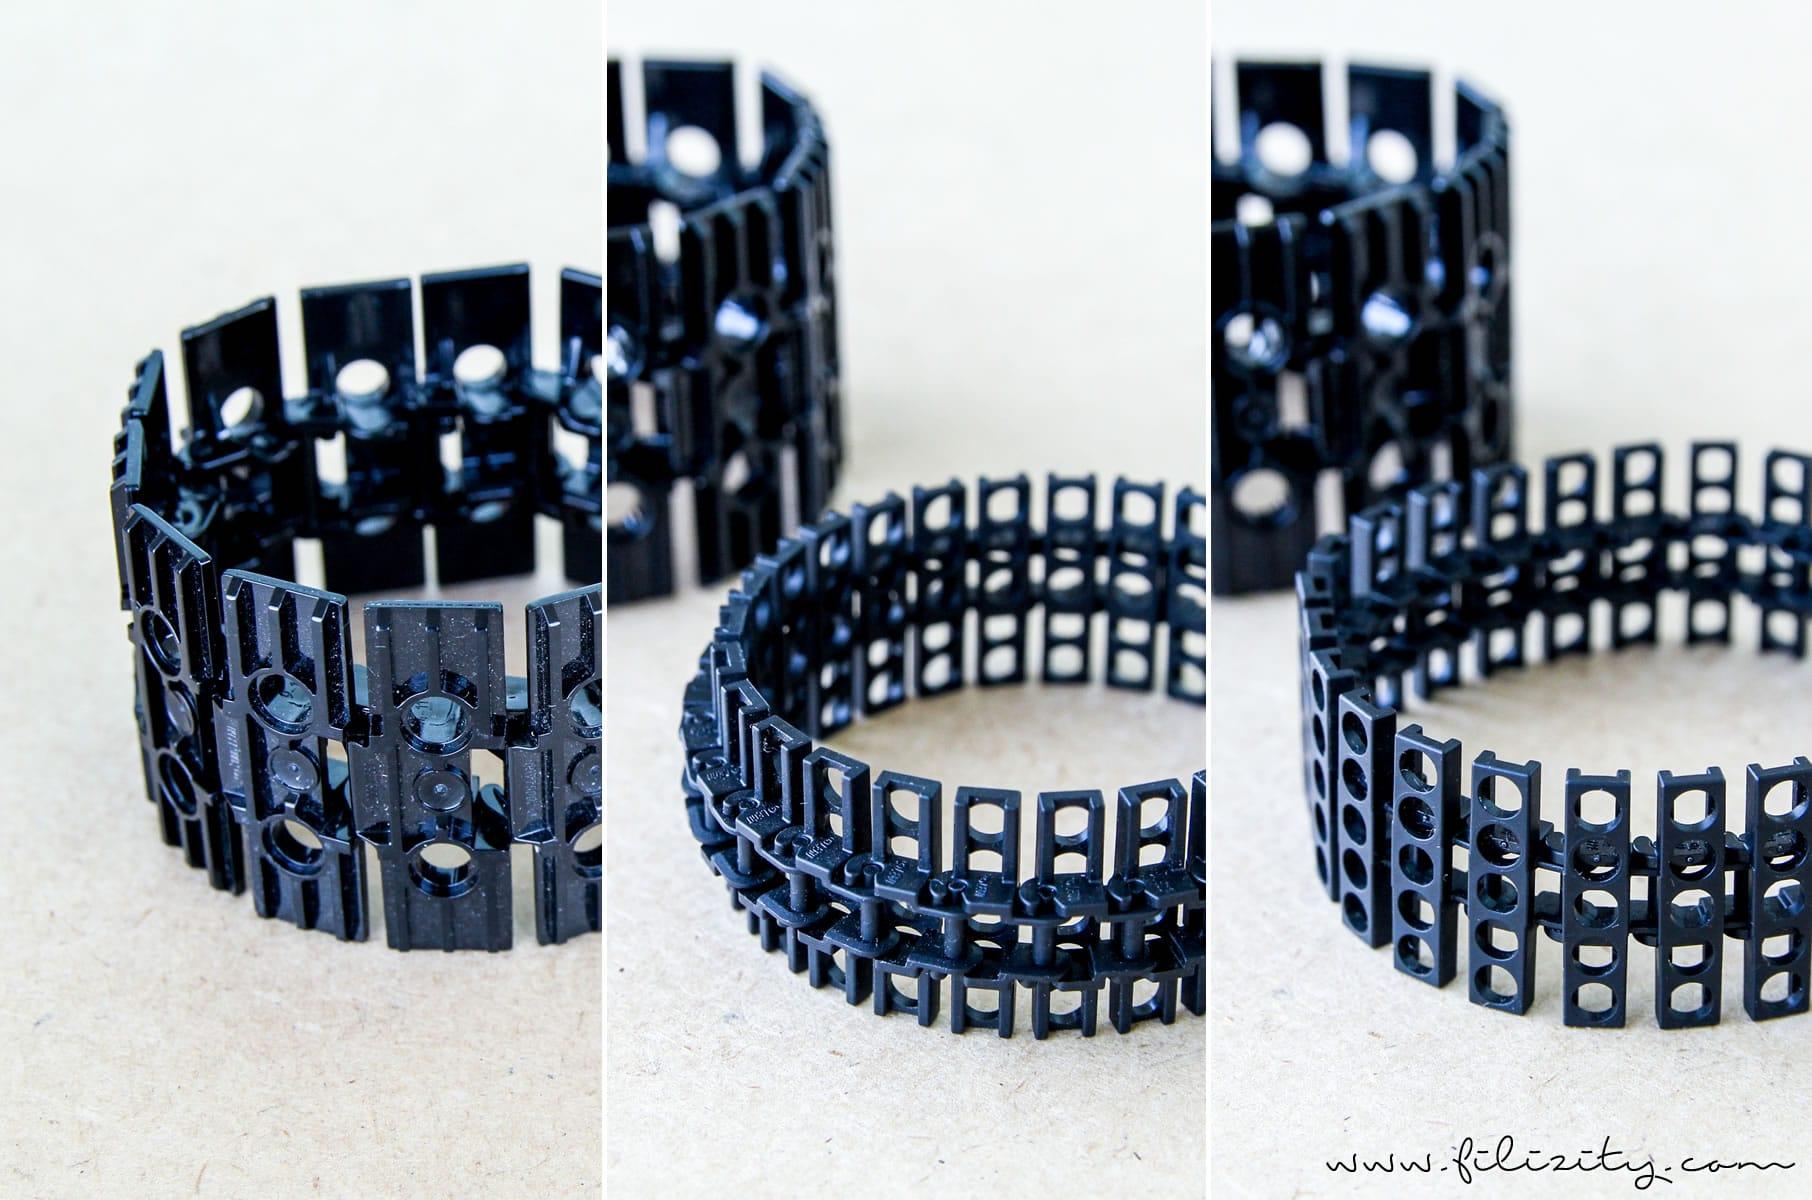 DIY Schmuck: Eleganter Armreif aus Lego-Panzerkette - Ergebnis